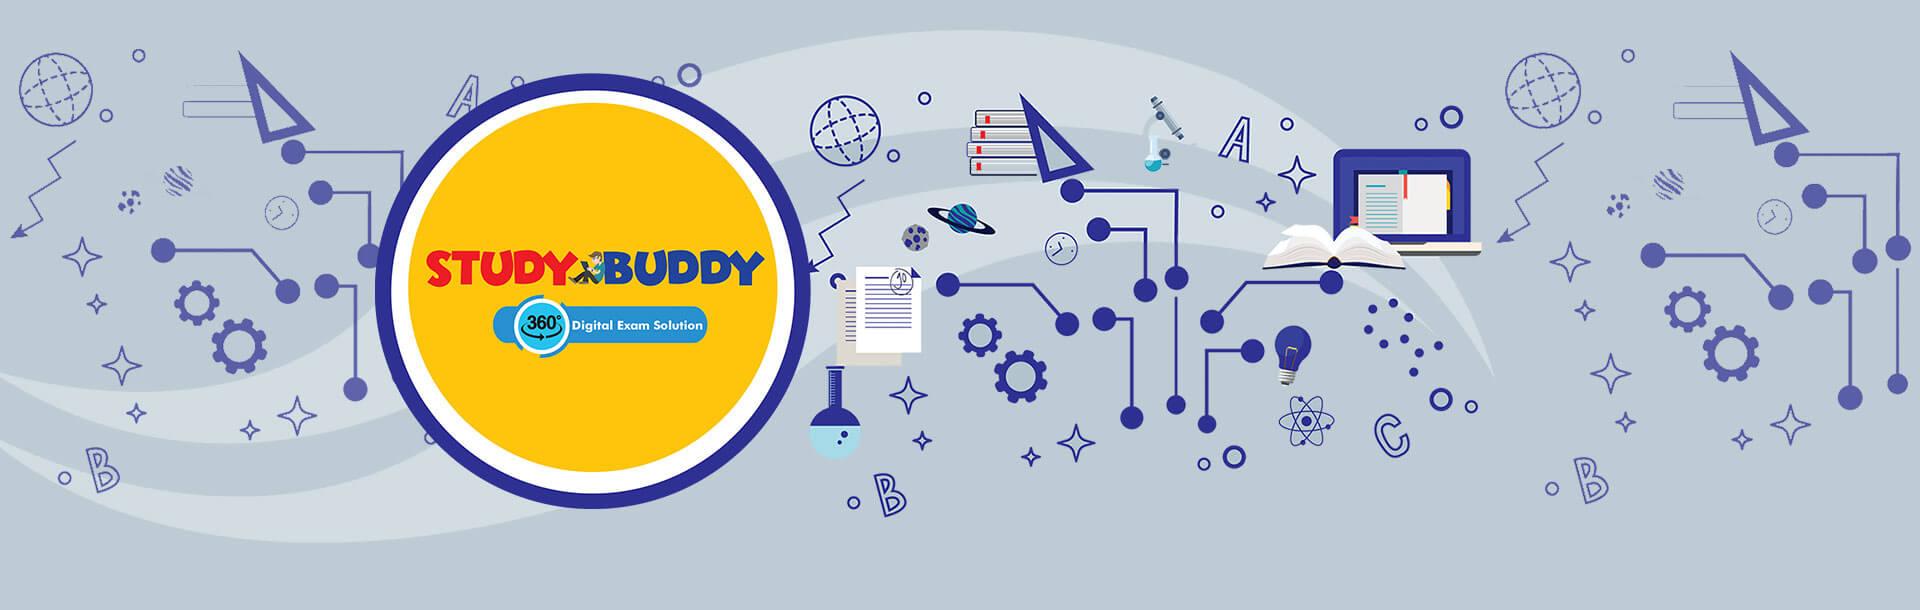 GET READY FOR STUDYBUDDY